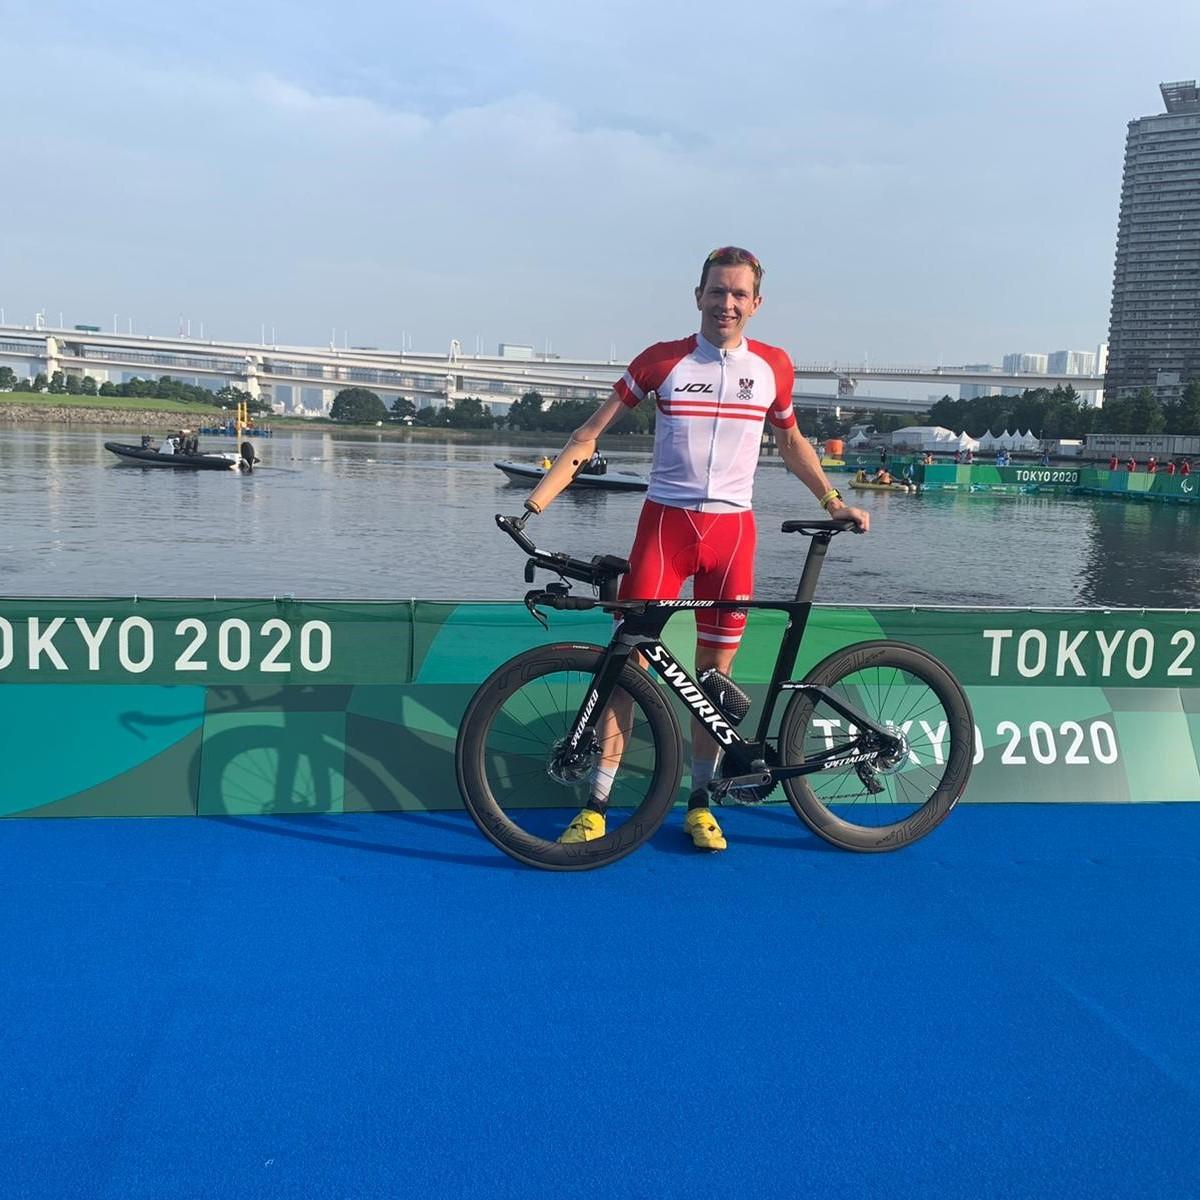 Medieninfo - Paralympics: Matzinger im Triathlon auf Platz neun